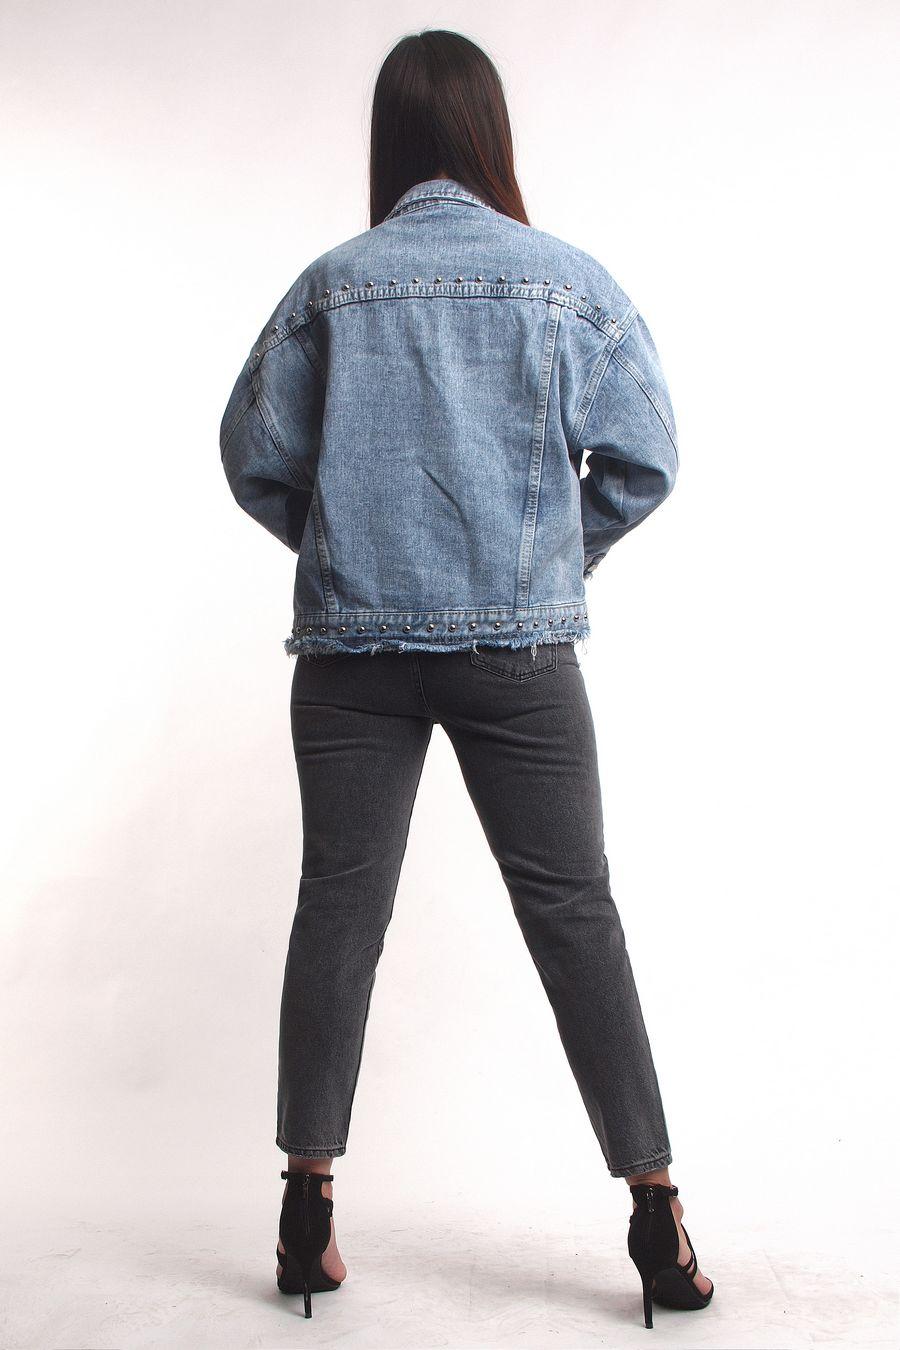 Жакет женский (джинсовка) LRZBS 2019 - фото 2